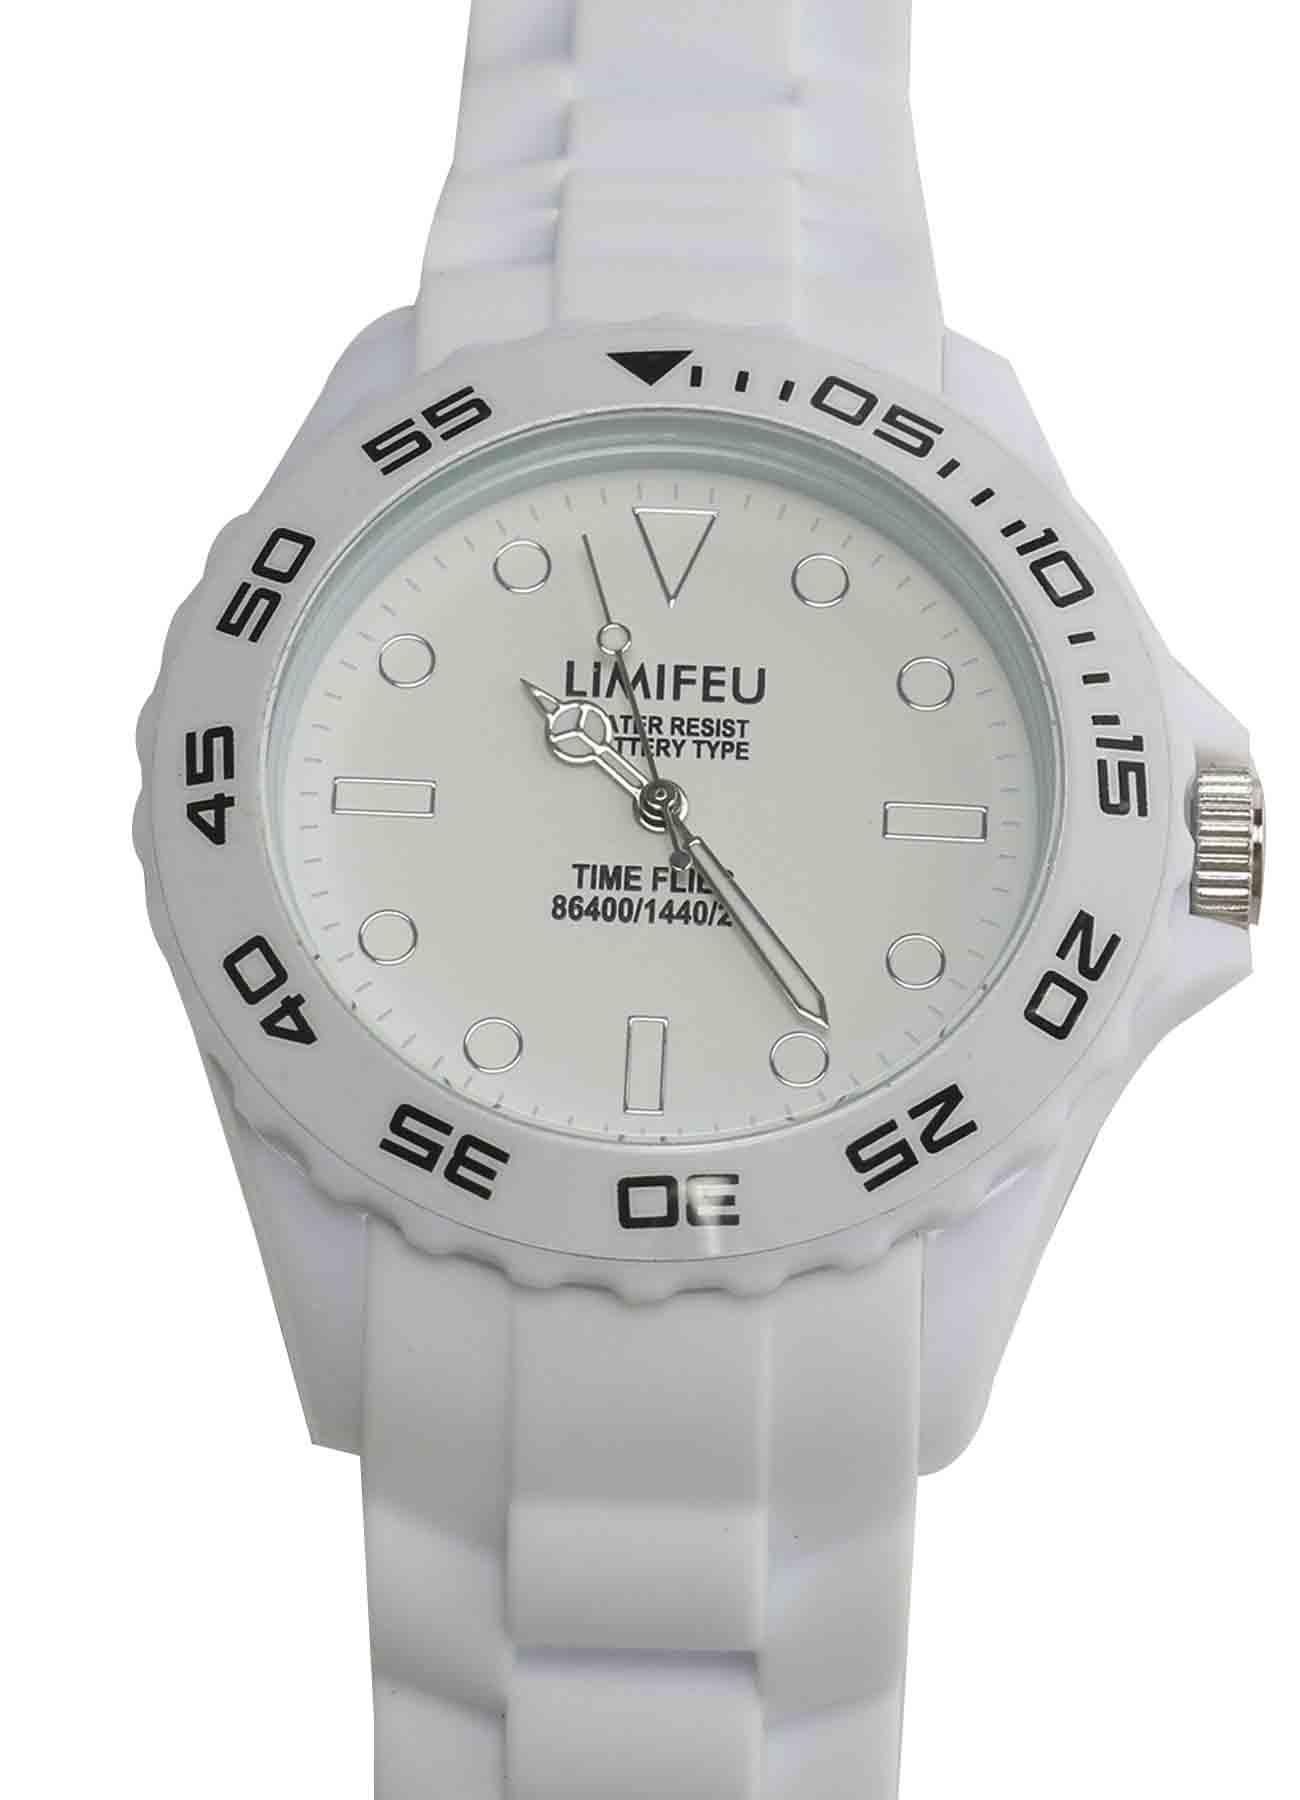 Time flies Wrist watch